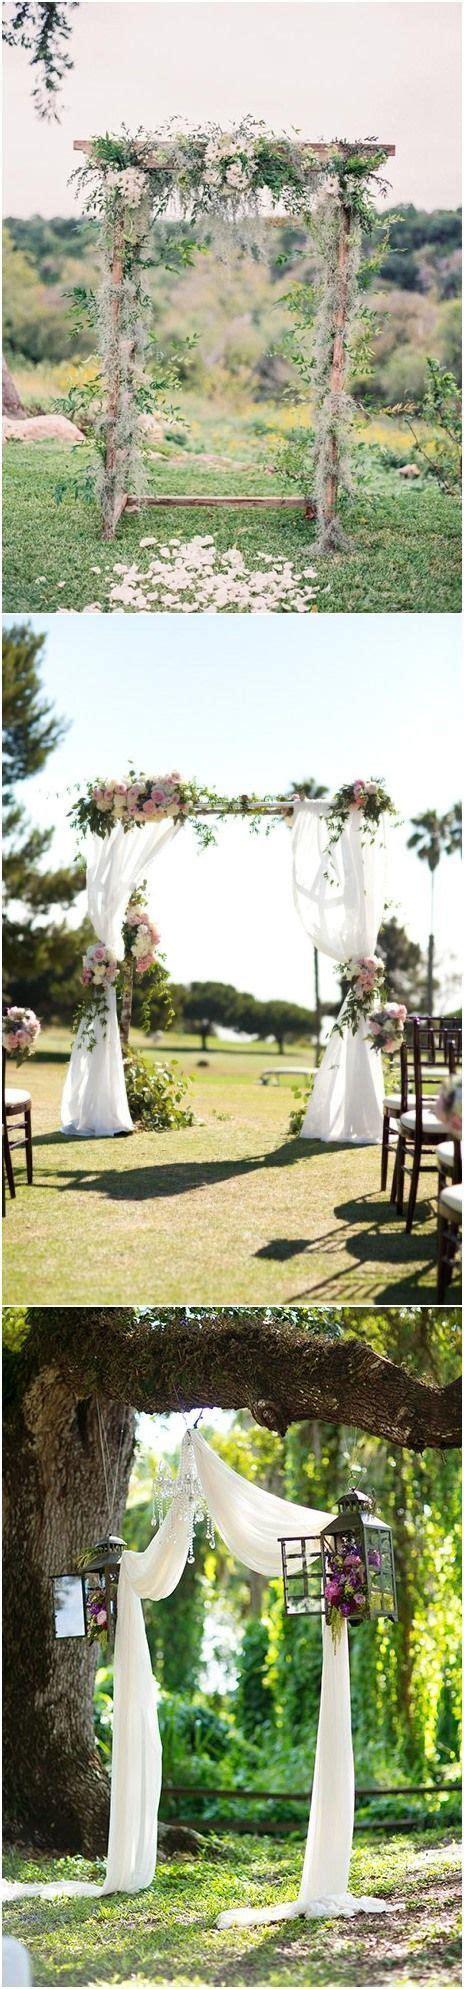 best 20 outdoor weddings ideas on pinterest tent best 20 outdoor weddings ideas on pinterest tent